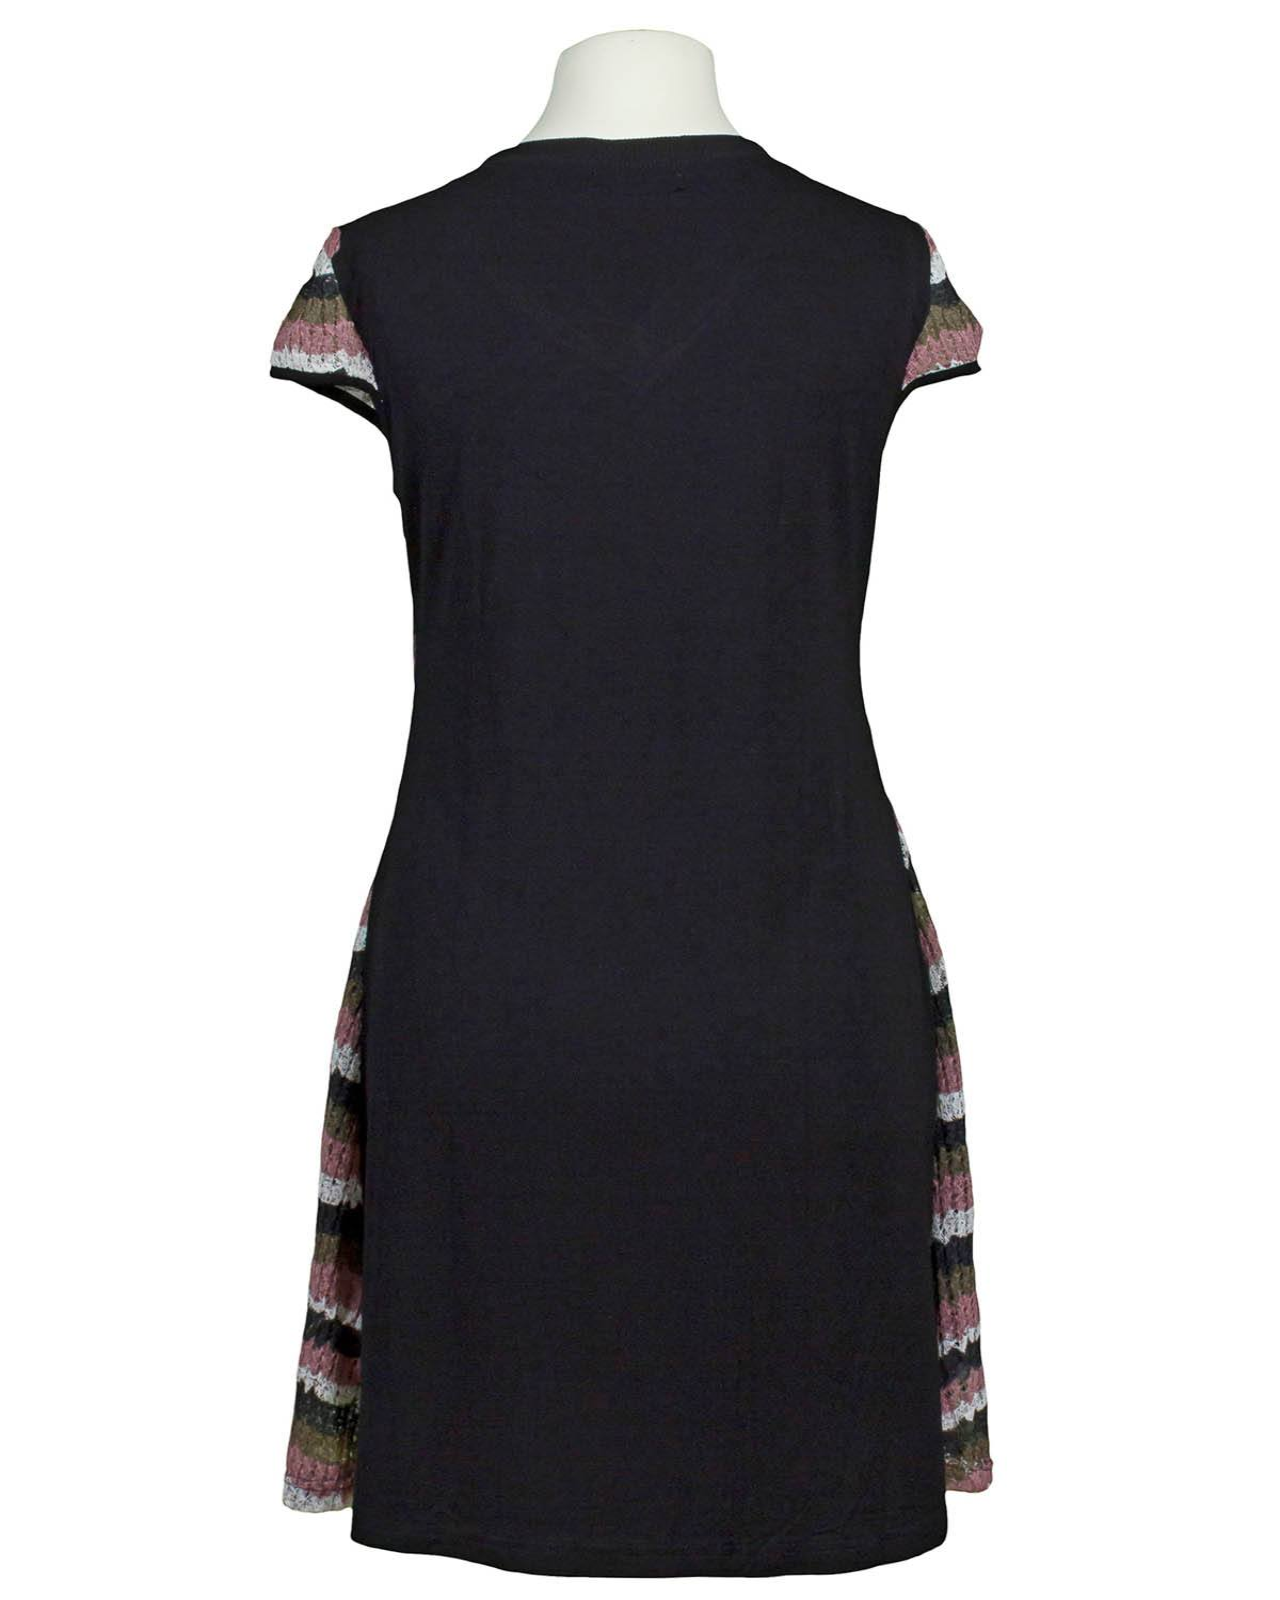 Kleid, schwarz multicolor